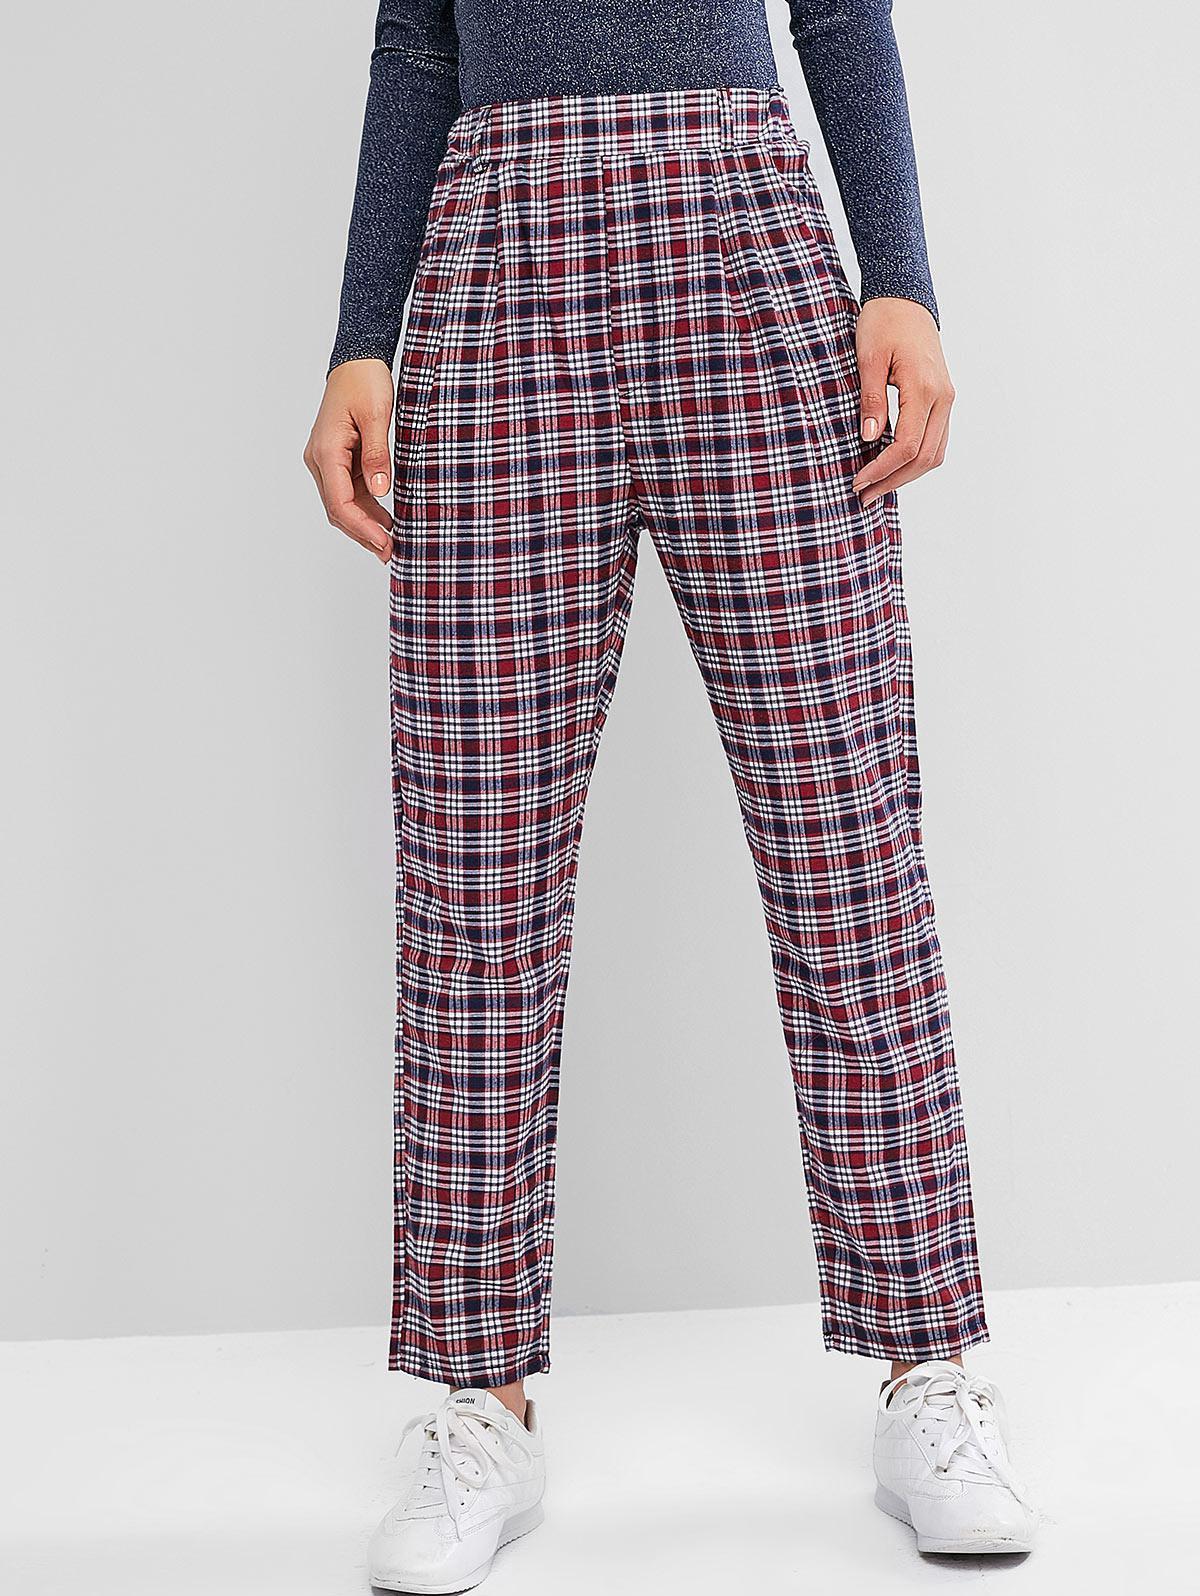 High Waisted Plaid Pockets Straight Pants, Multi